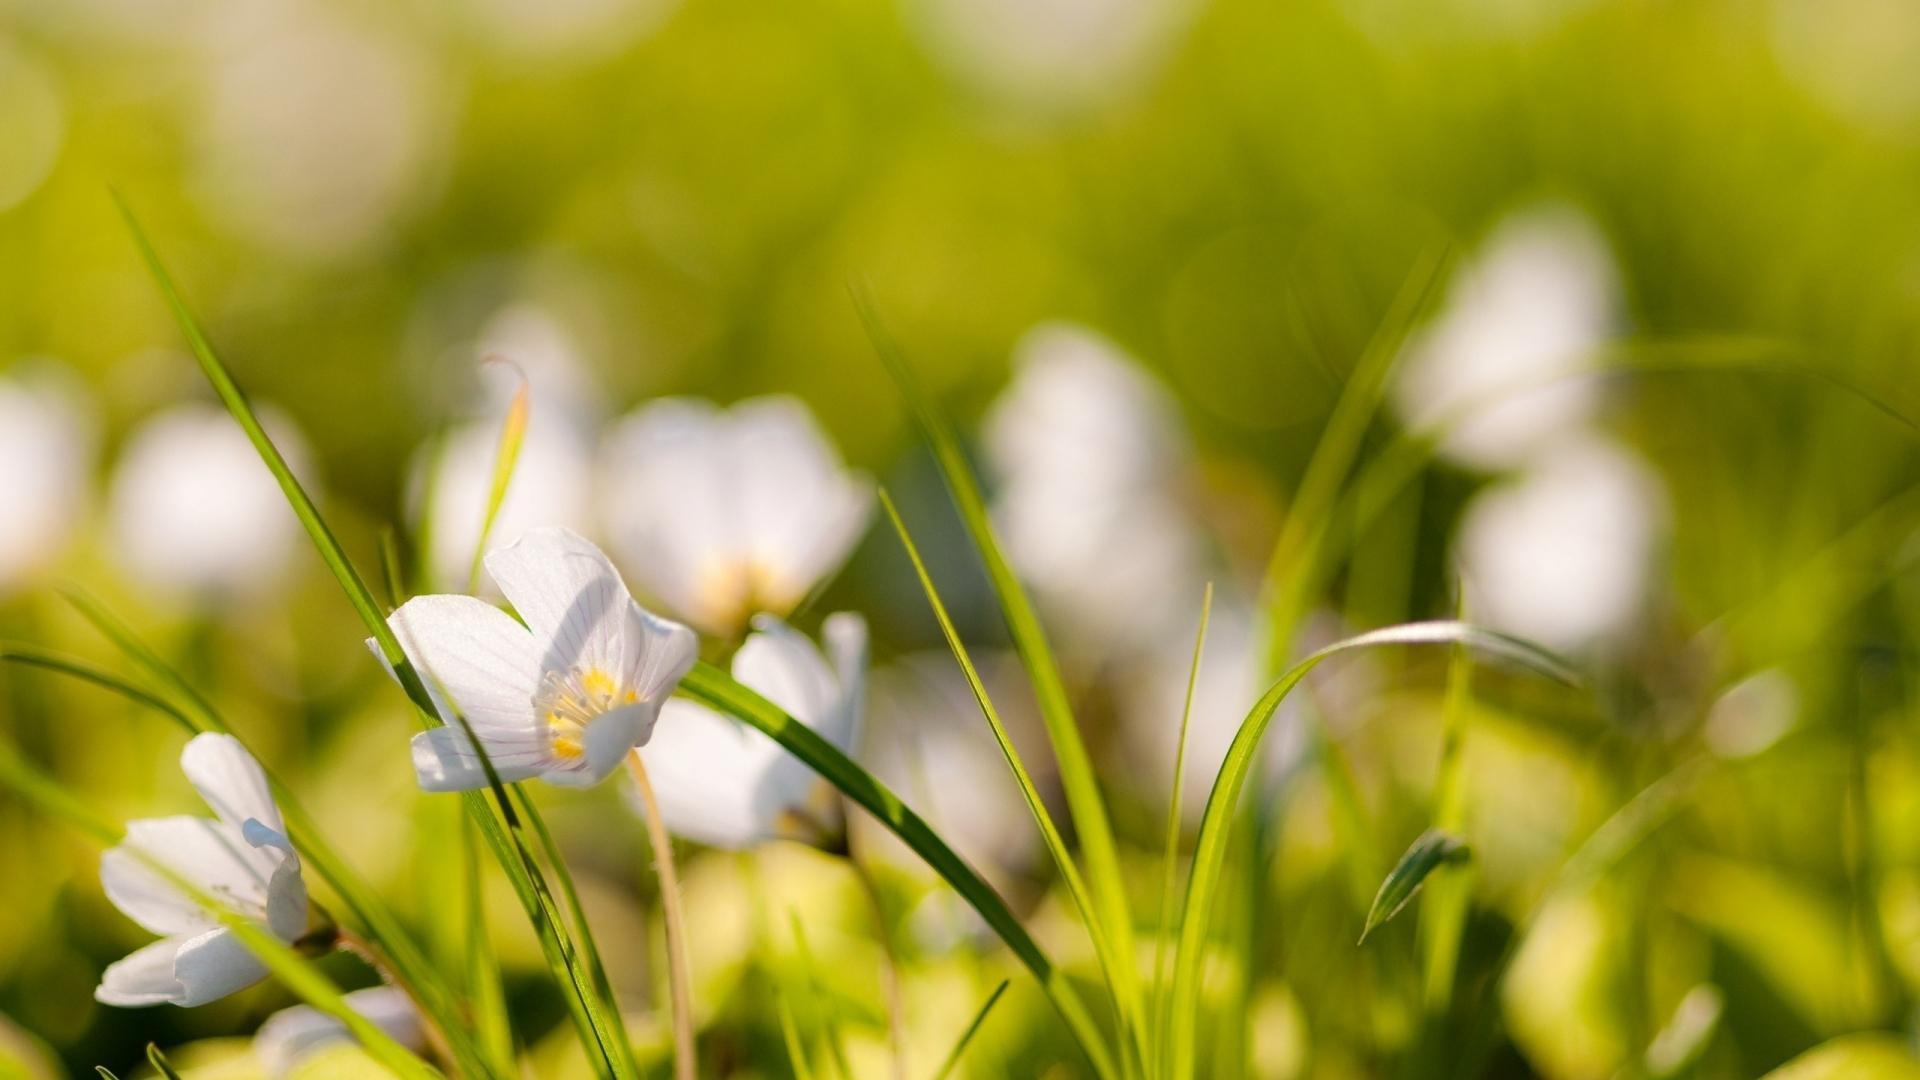 Pequenas flores blancas - 1920x1080